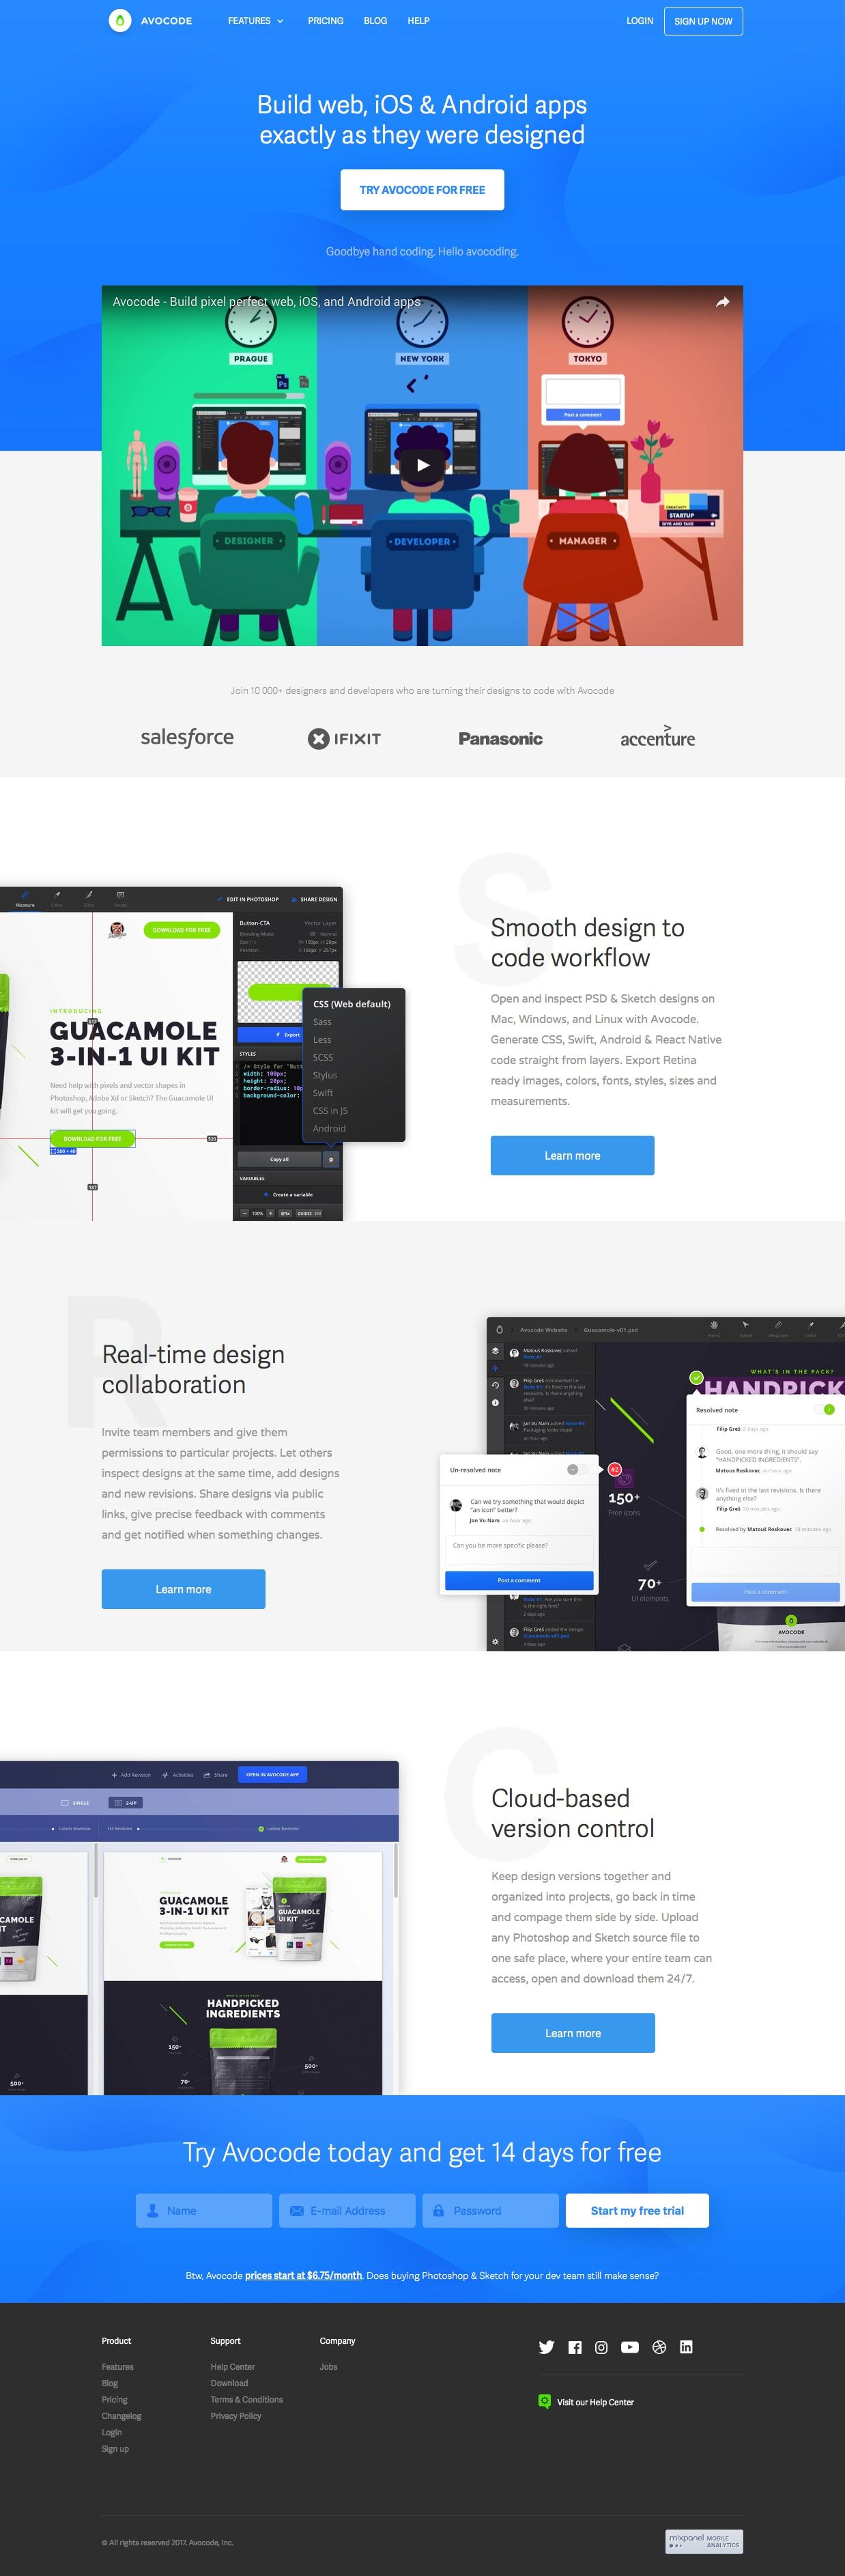 Use Avocode To Be Featured On Instagram A Few Fantastic Screens From 2018designreport By Vucek Web Design Business Website Design Modern Website Design